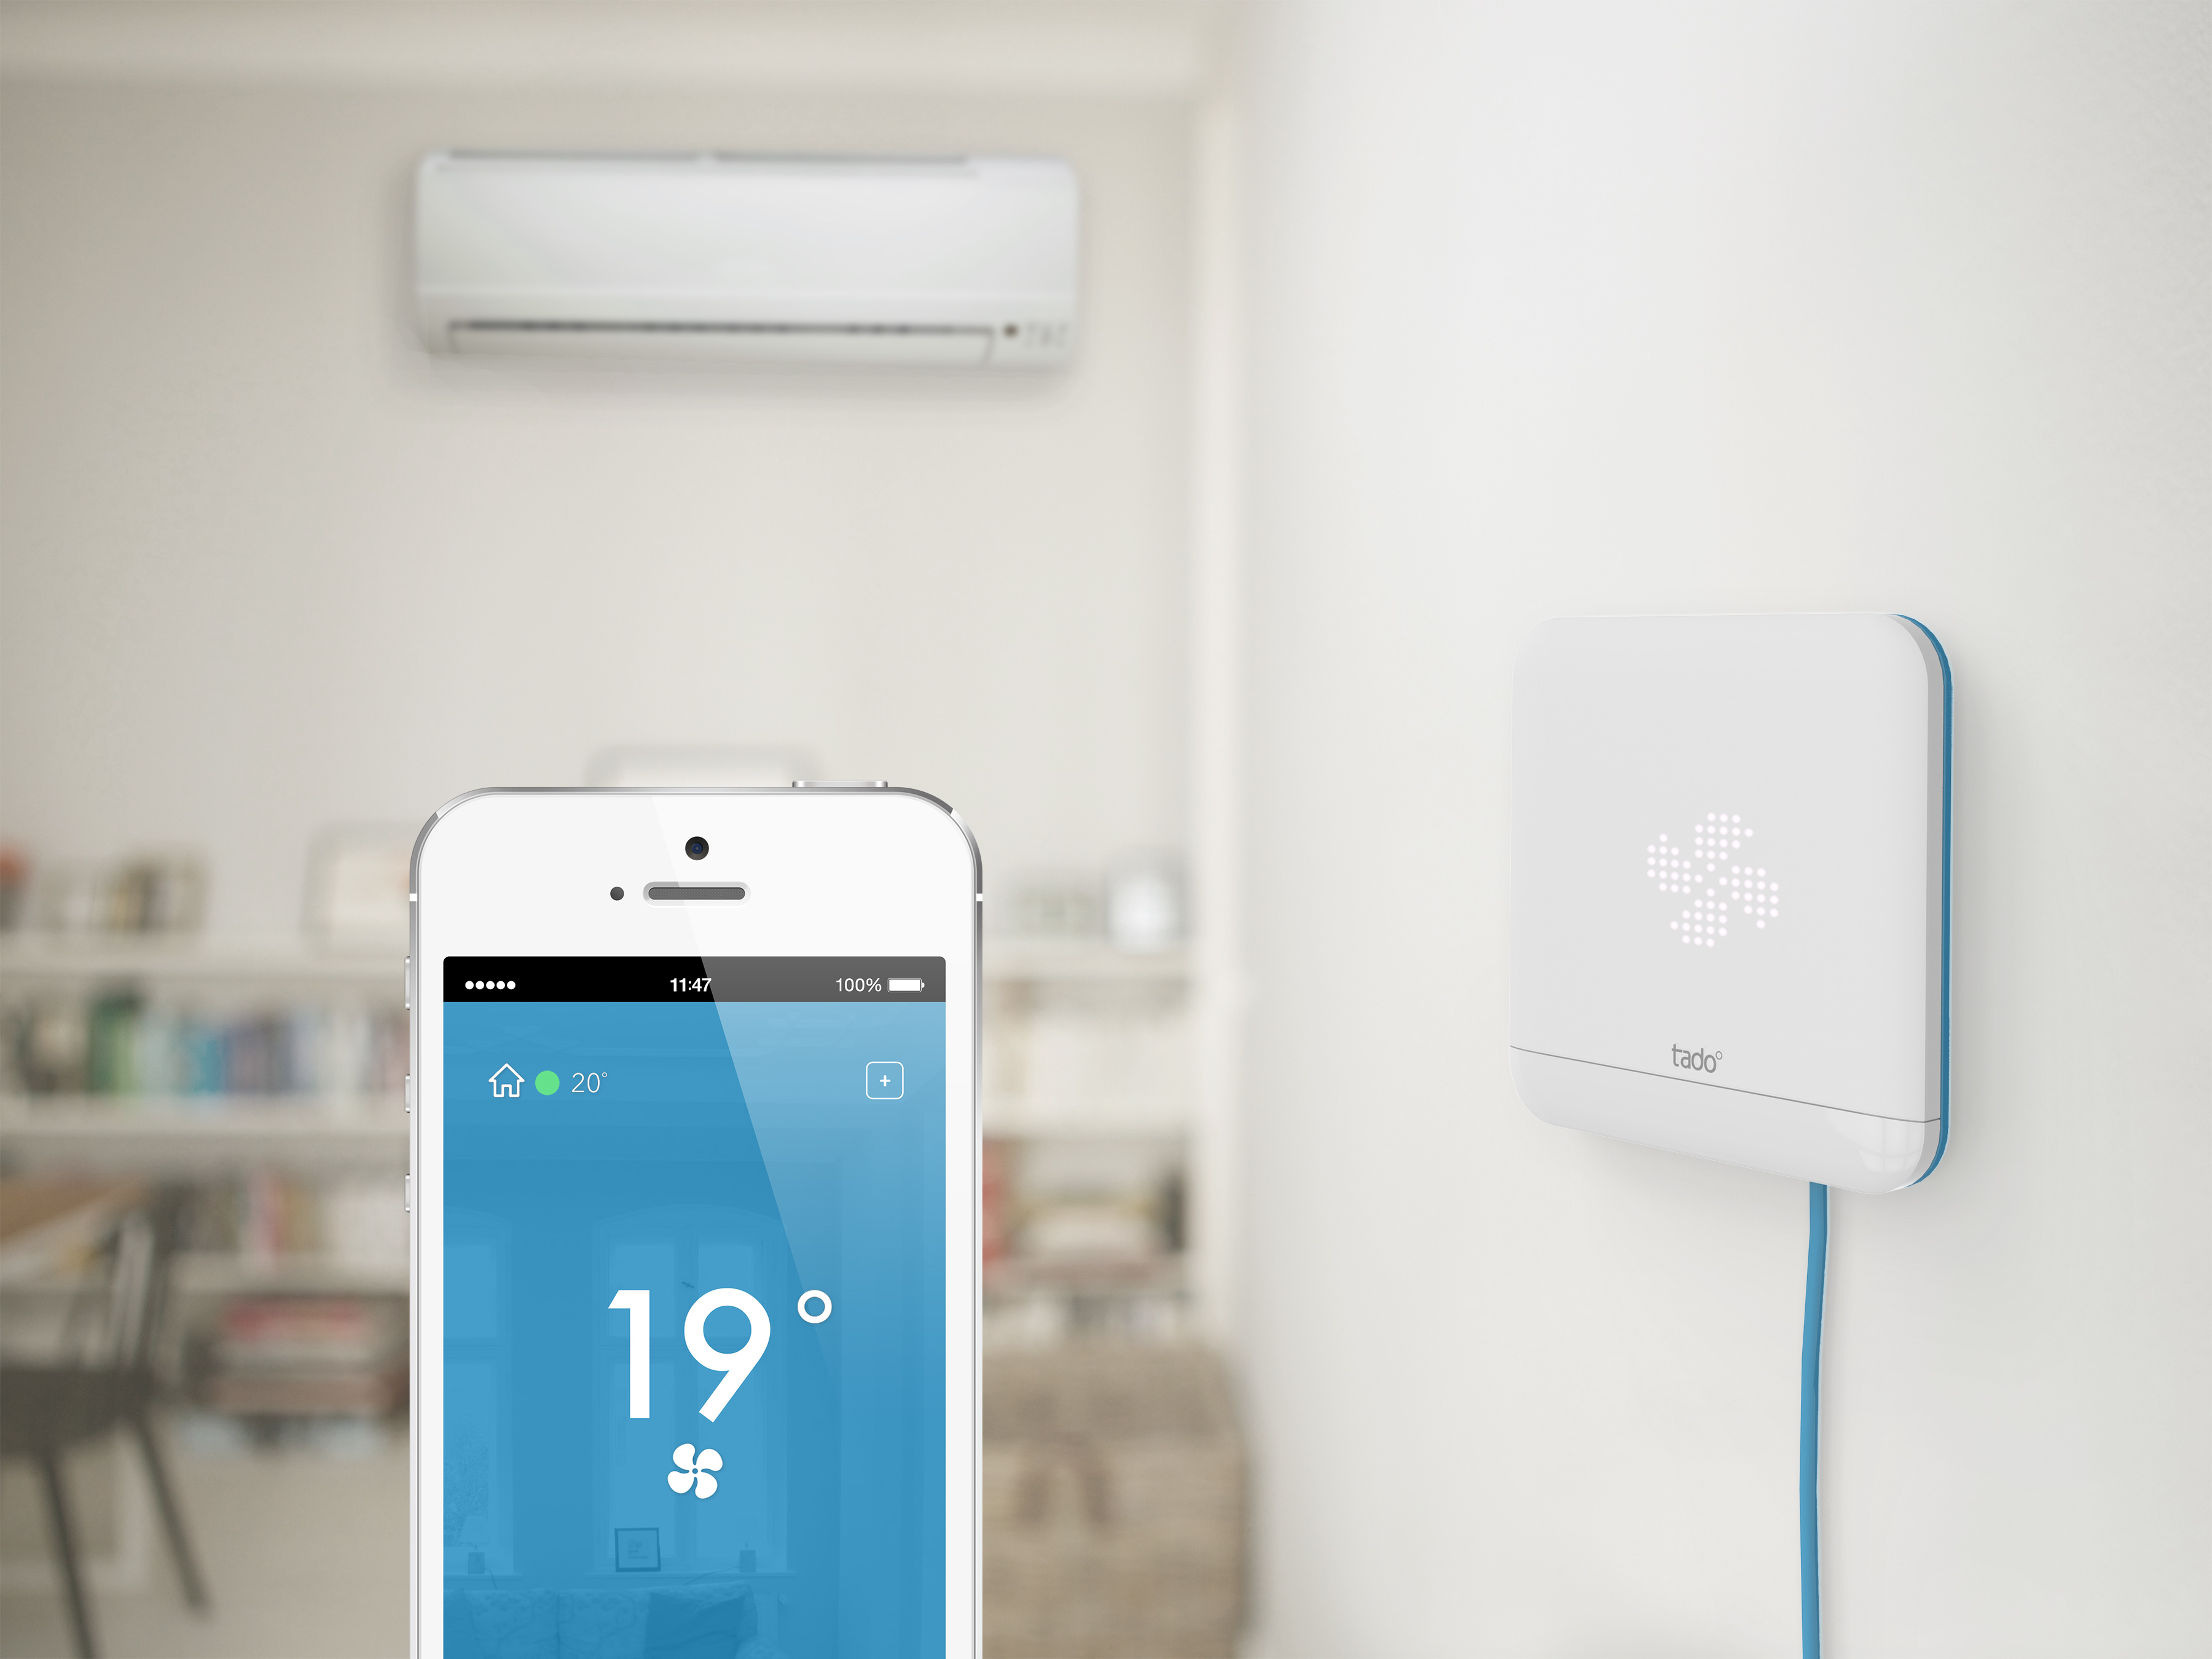 TADO AC01 Smart AC Control Klimaanlagensteuerung